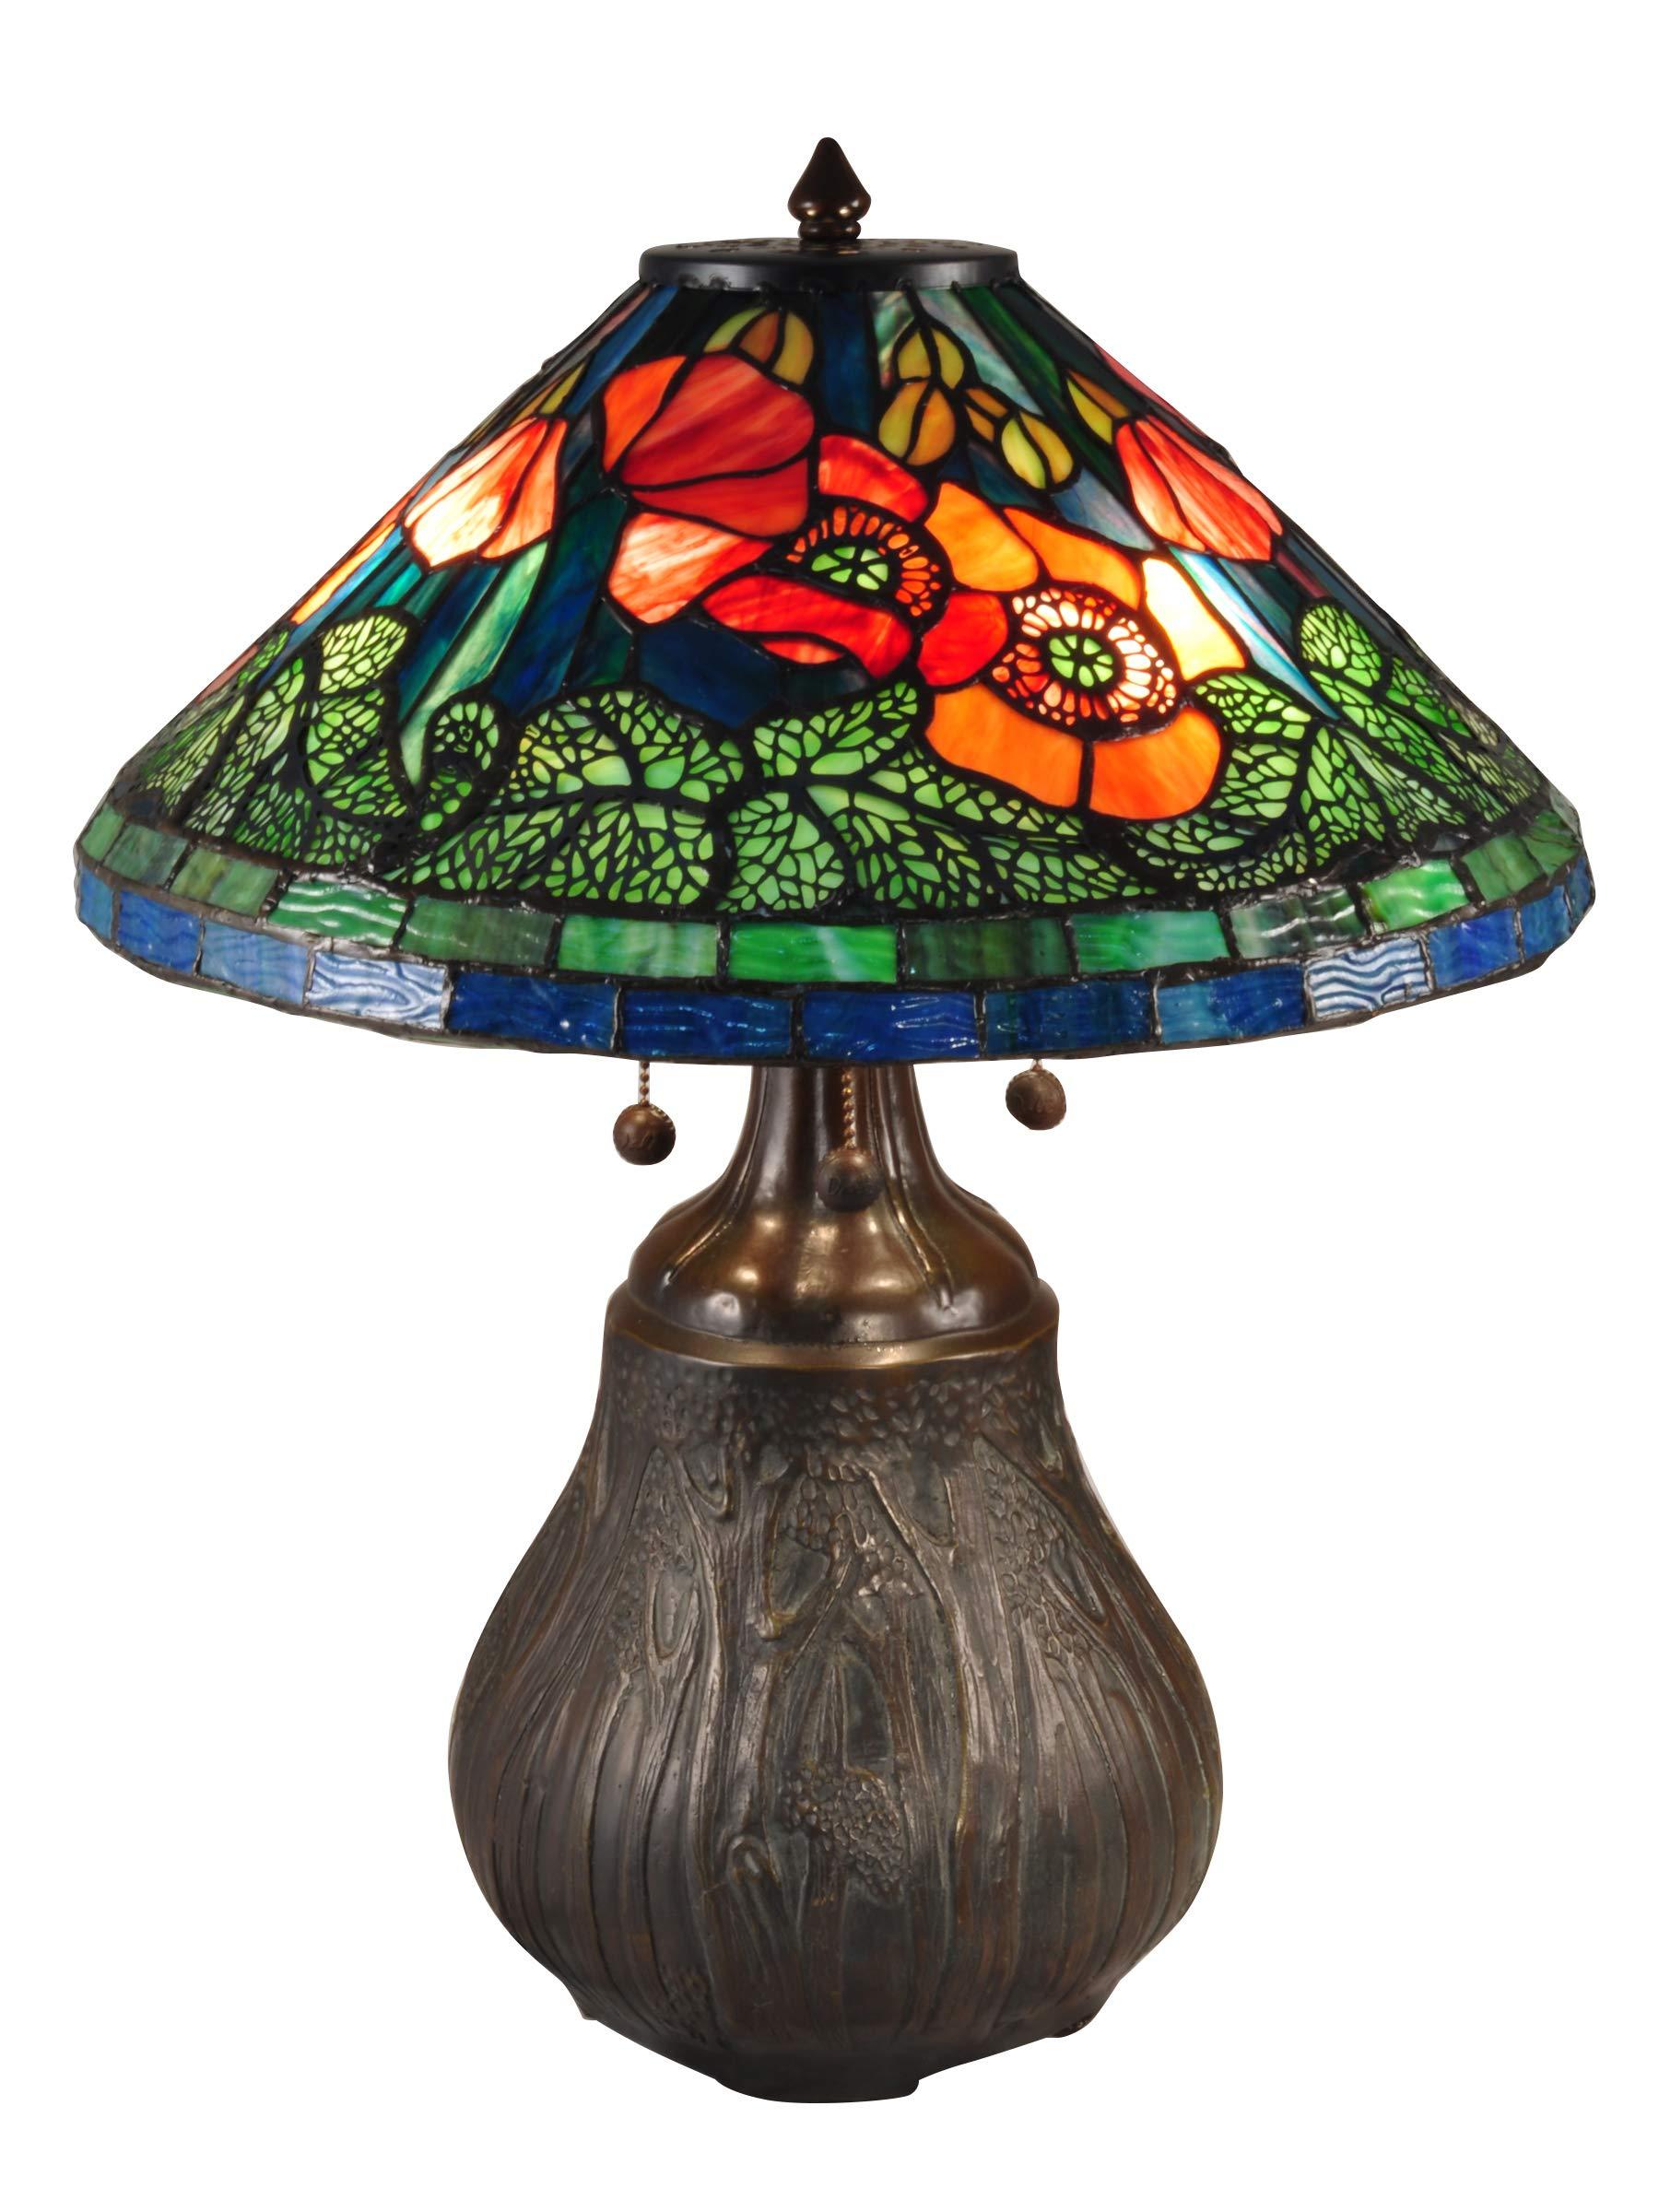 Dale Tiffany TT15119 Dallas Peony Table Lamp 22'' Amber